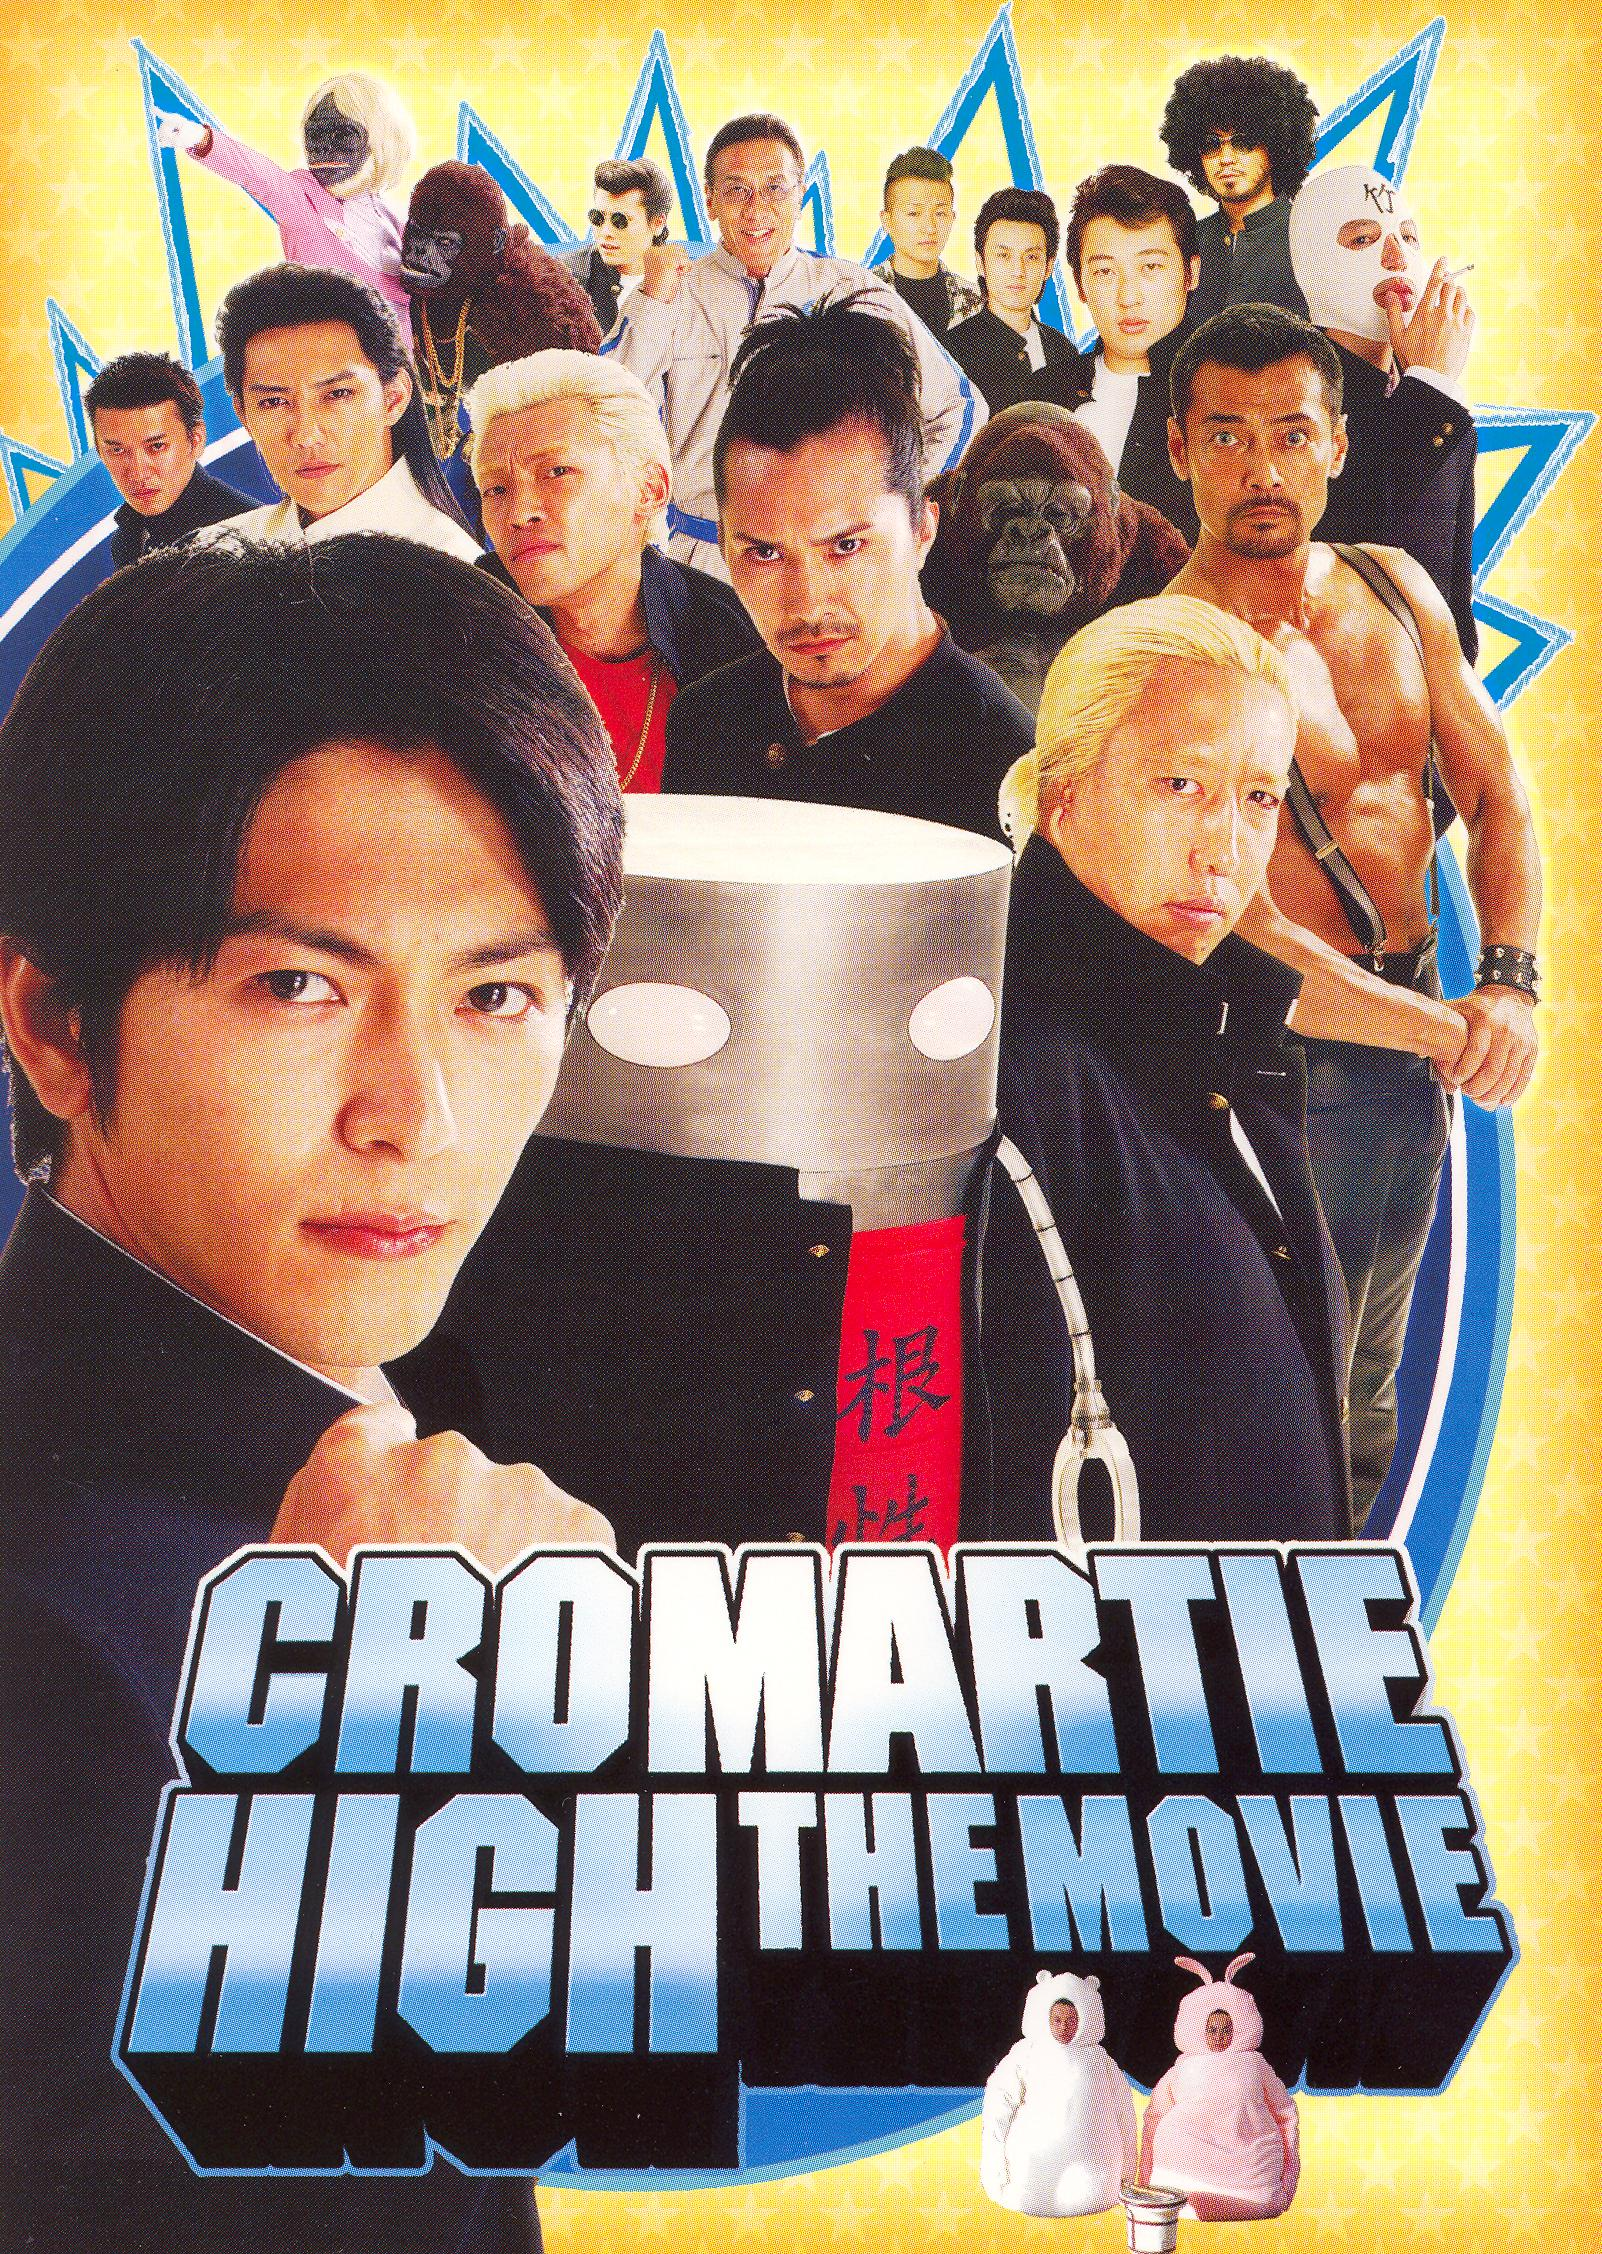 Cromartie High: The Movie